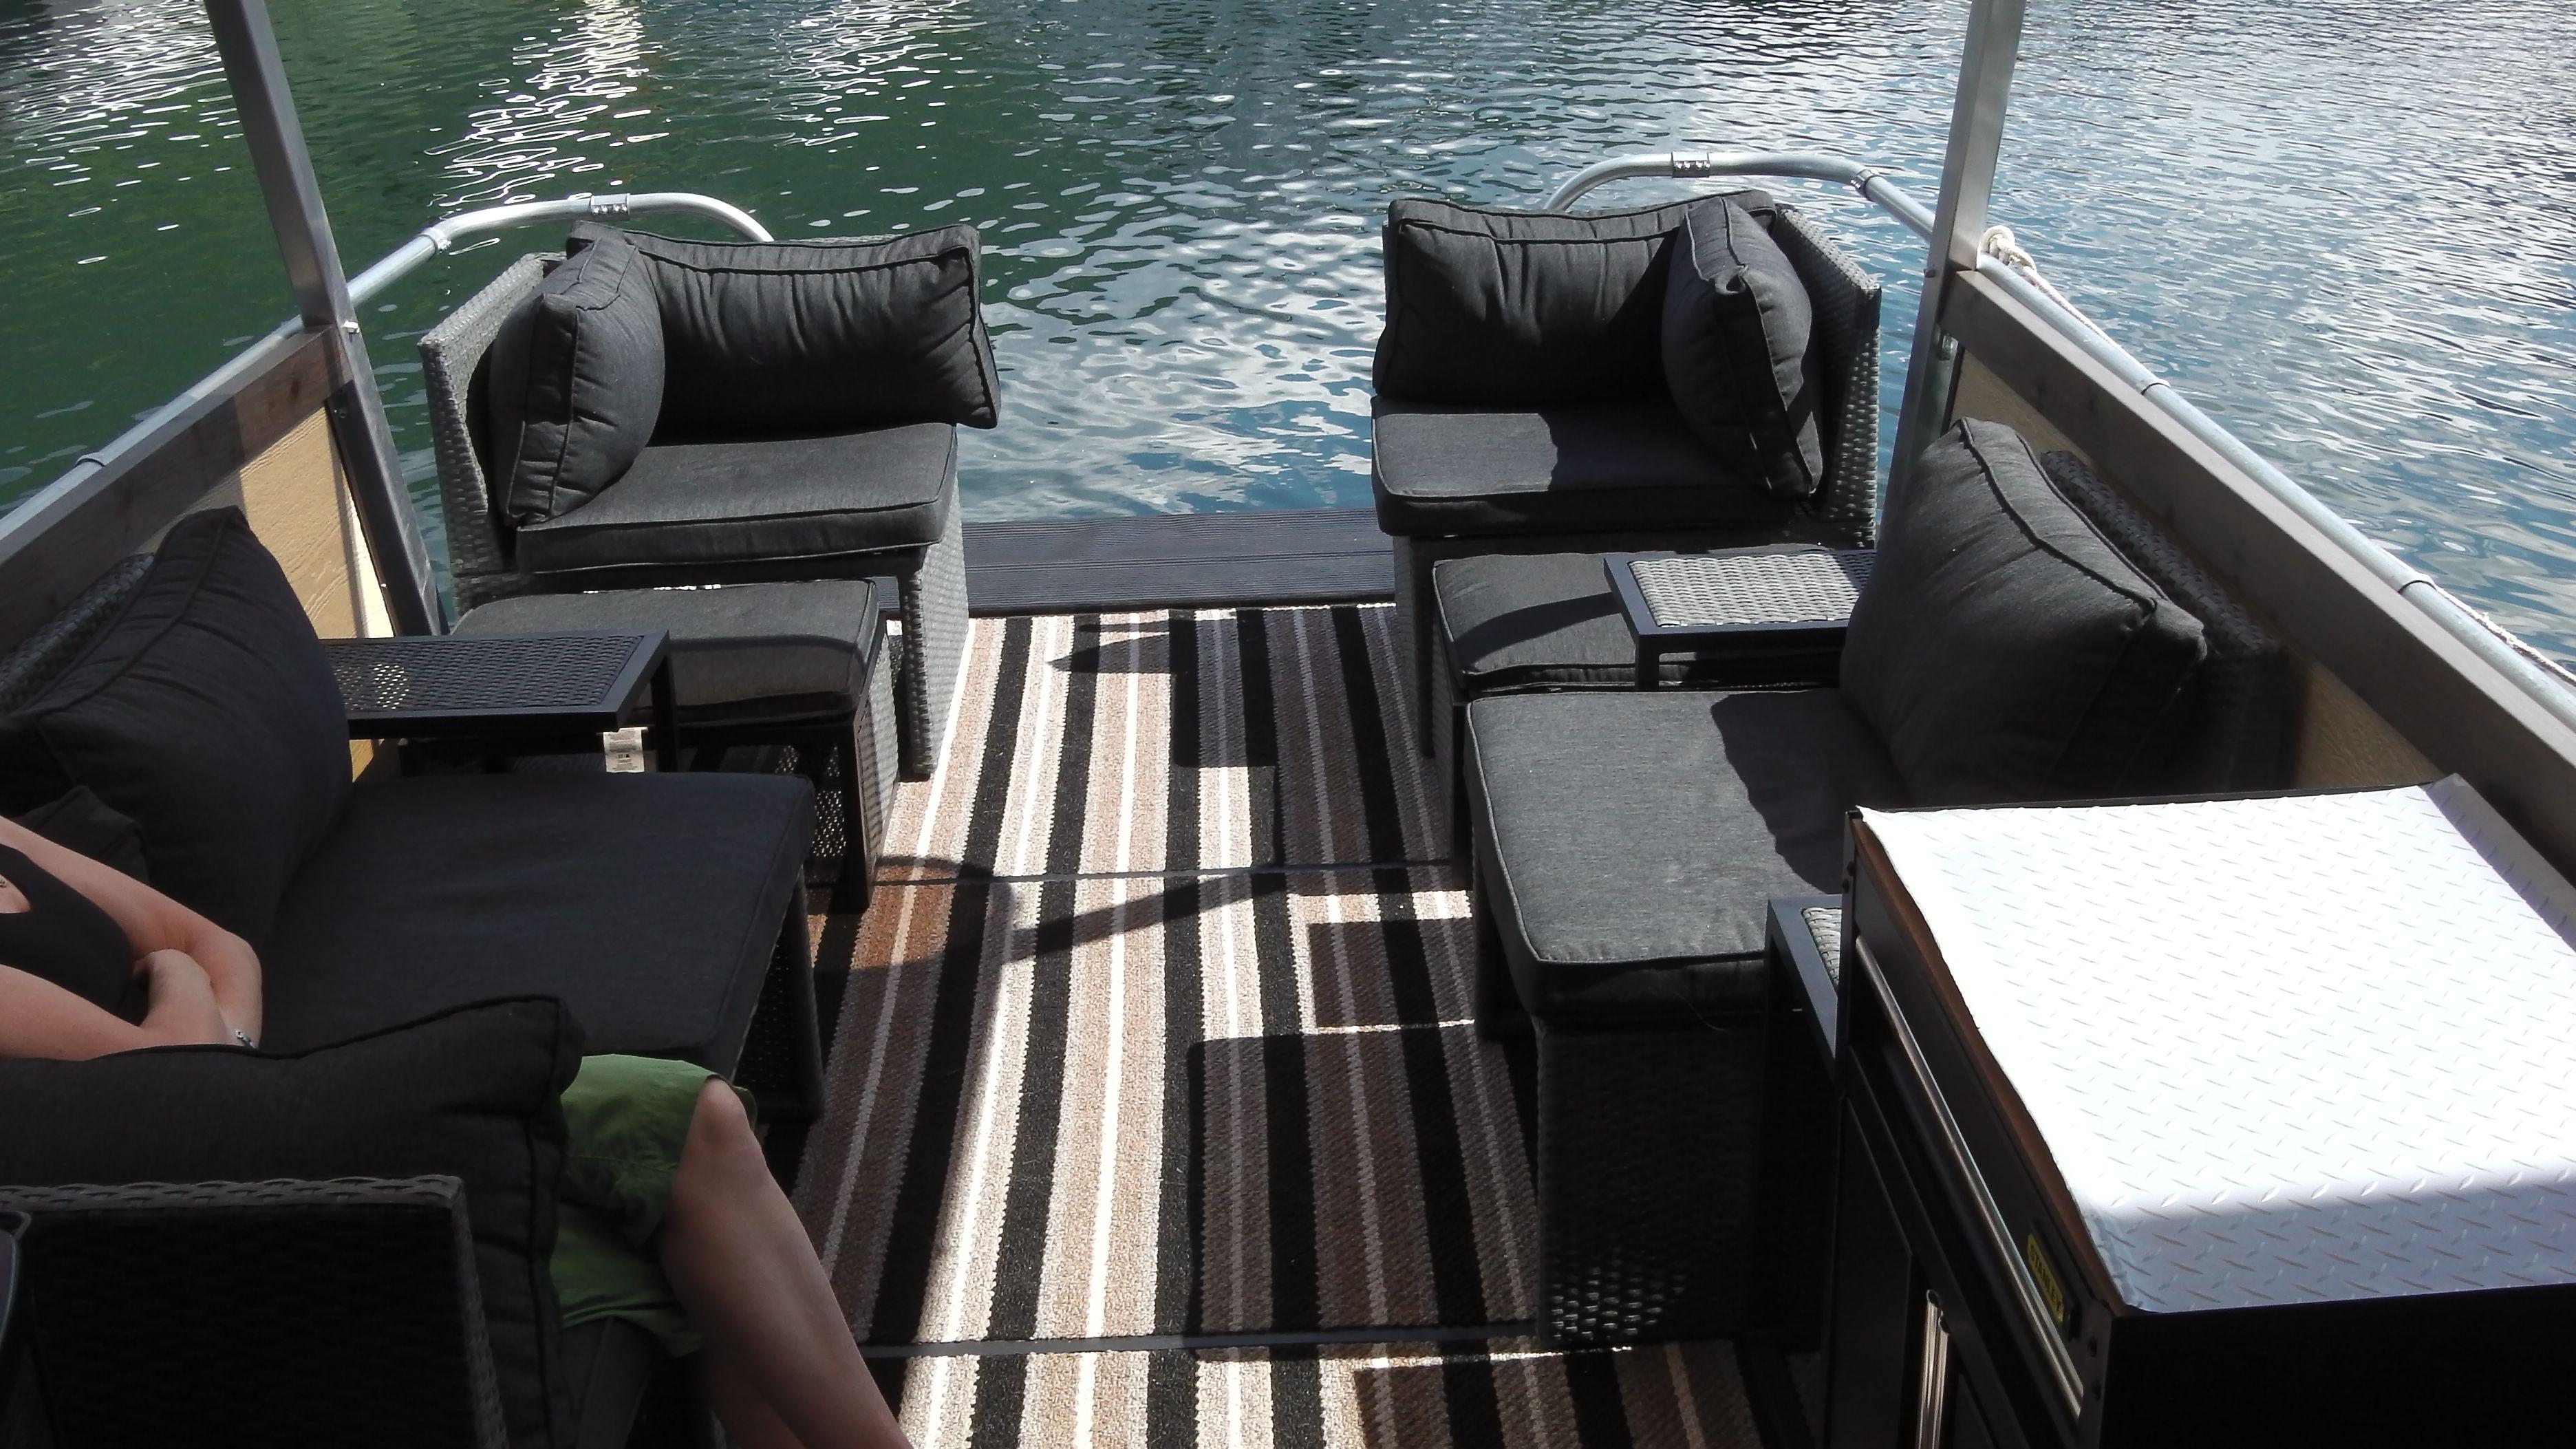 Custom 21 Foot Pontoon Boat Global Product Reviews